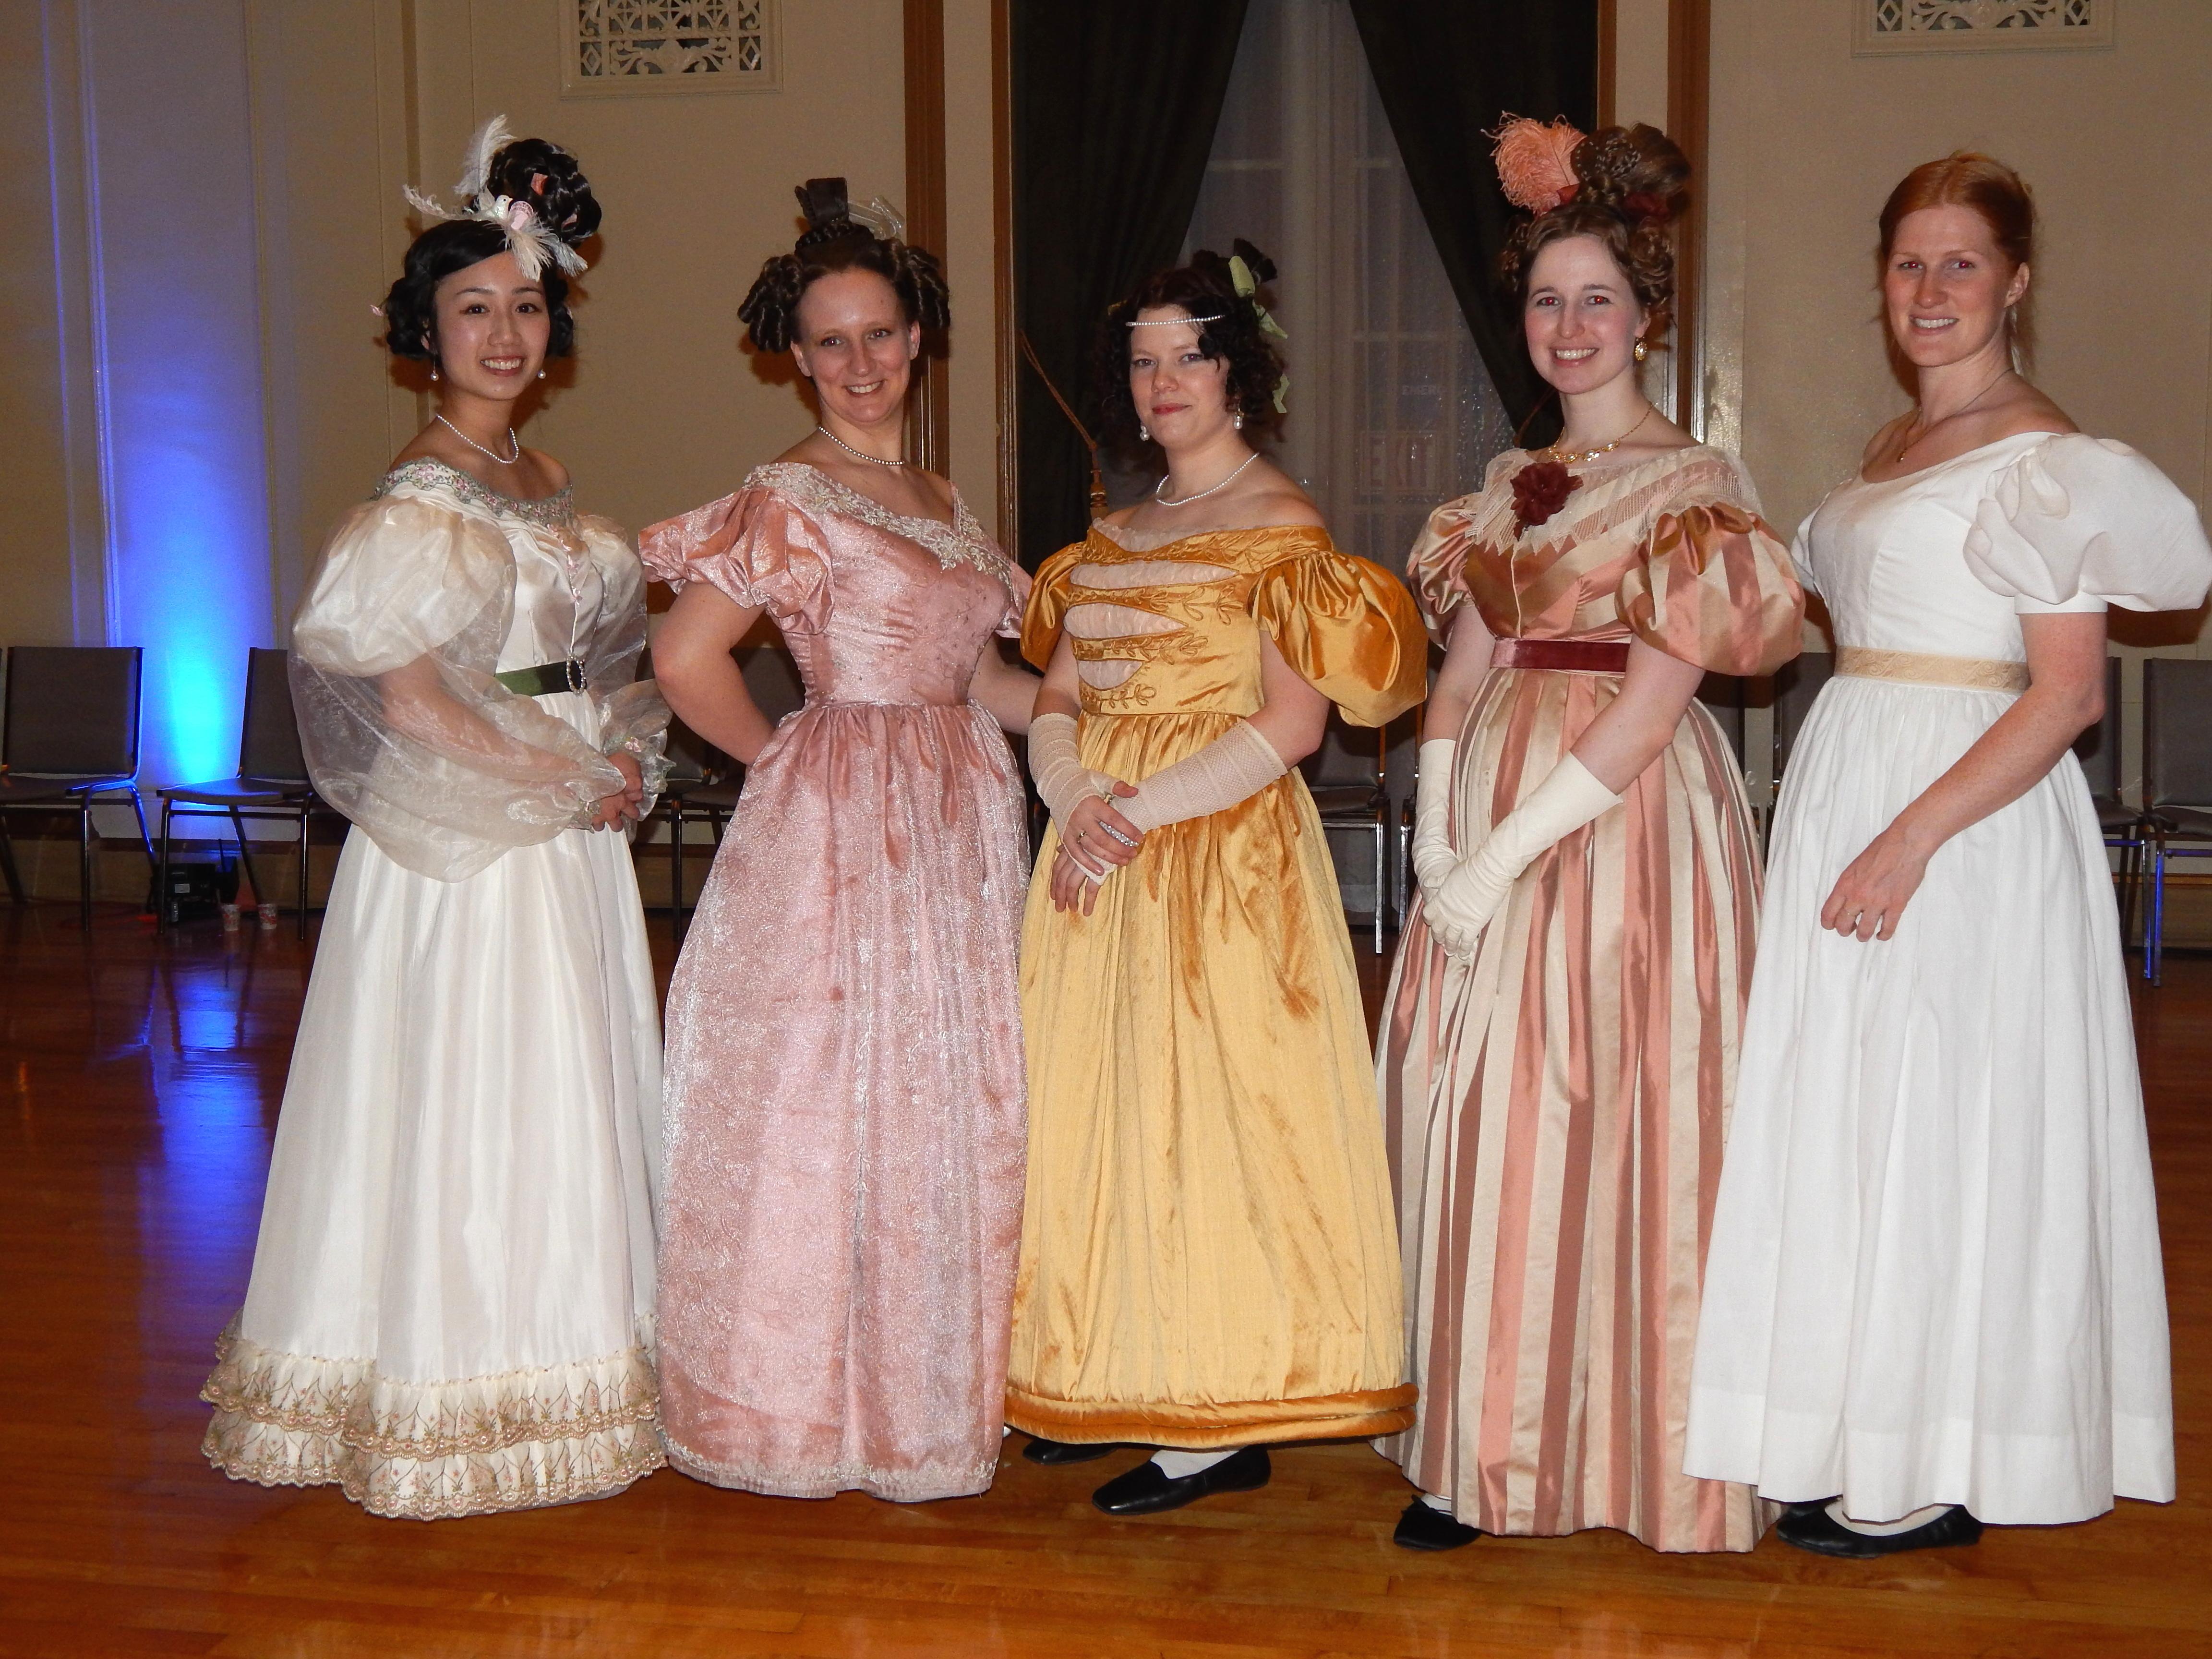 The Romantic Period Evening Dress